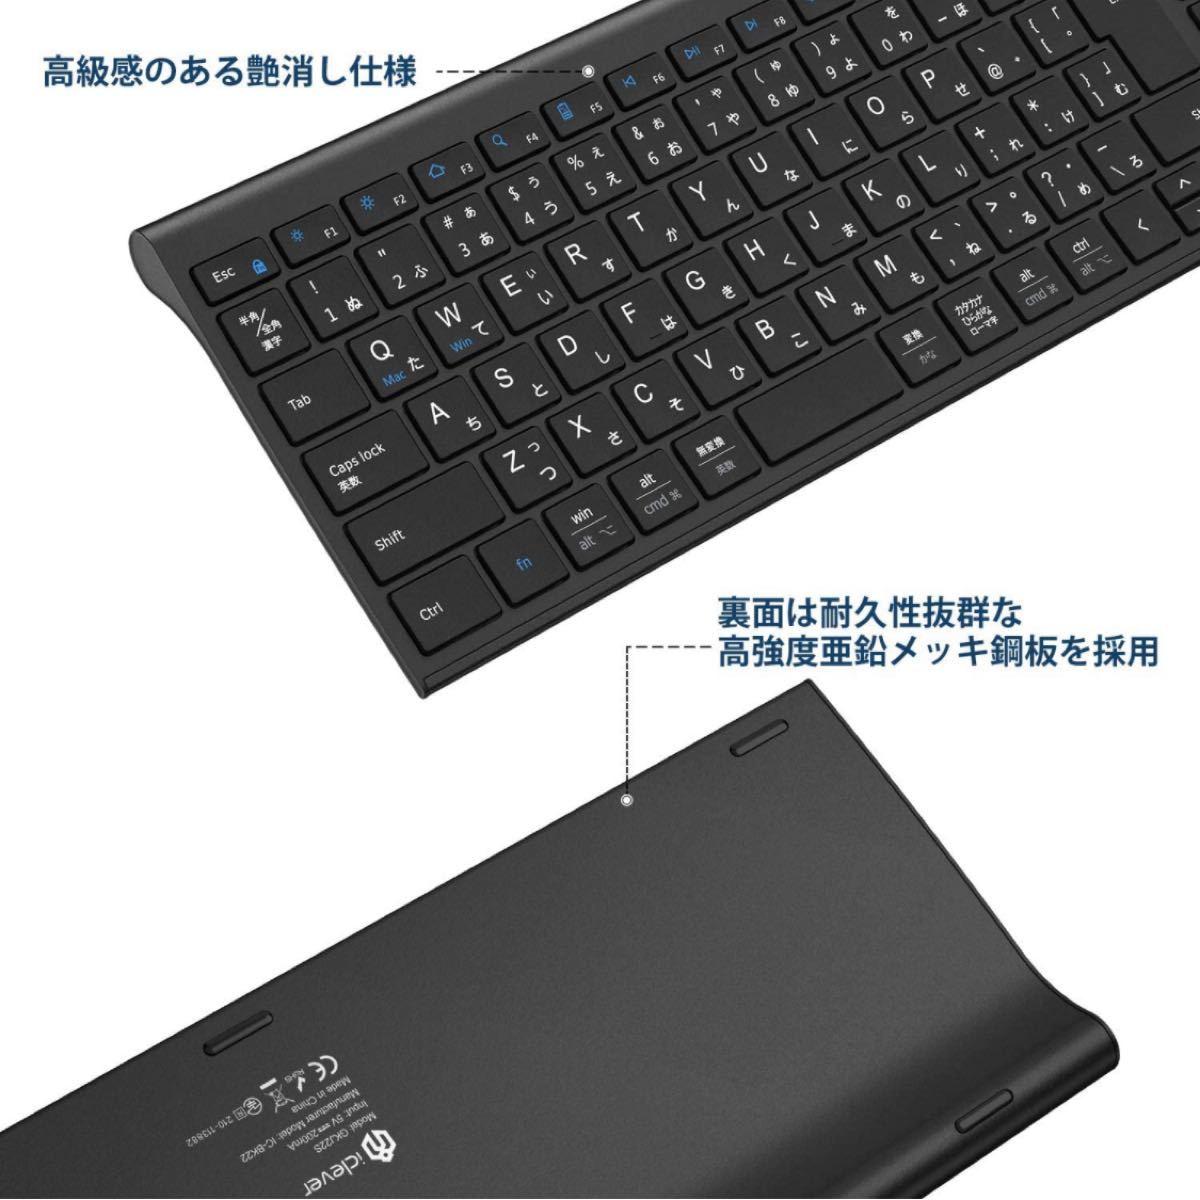 iClever キーボードワイヤレスキーボード JIS基準 日本語配列 超薄型 テンキー付き 無線 2.4G キーボード USB